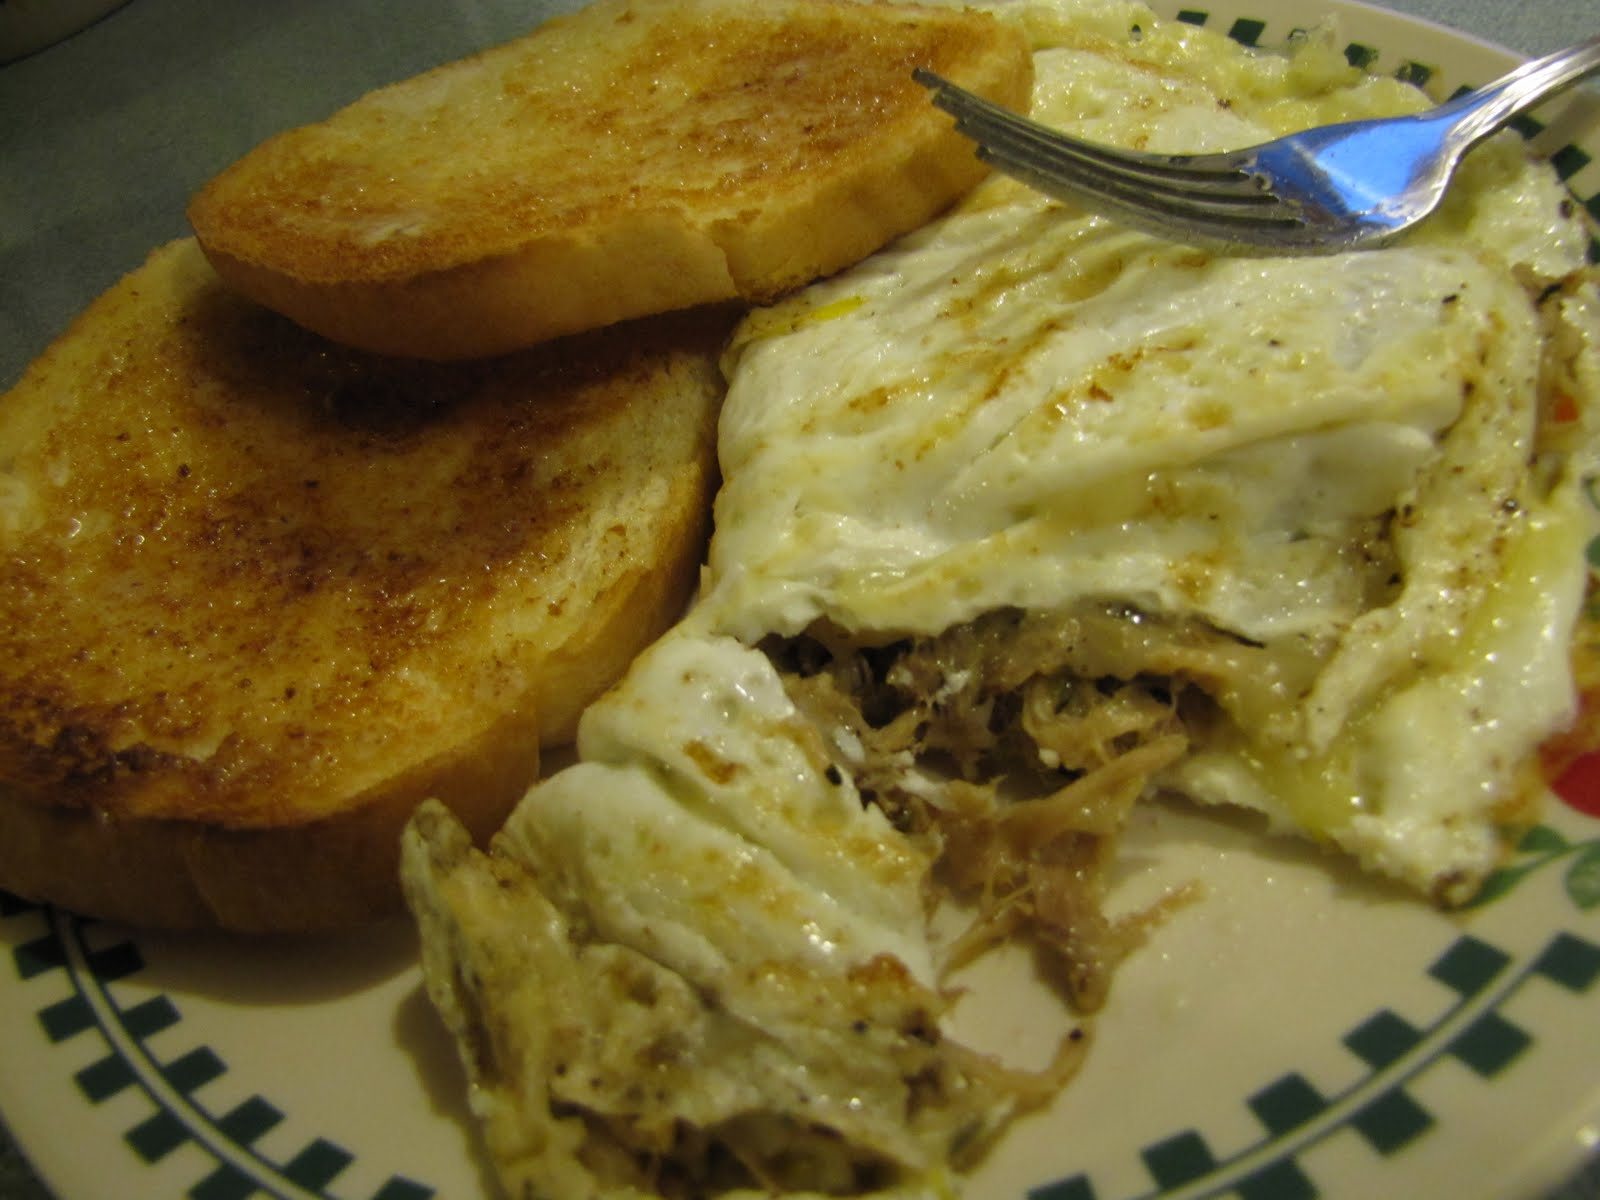 how to make a good egg omelet